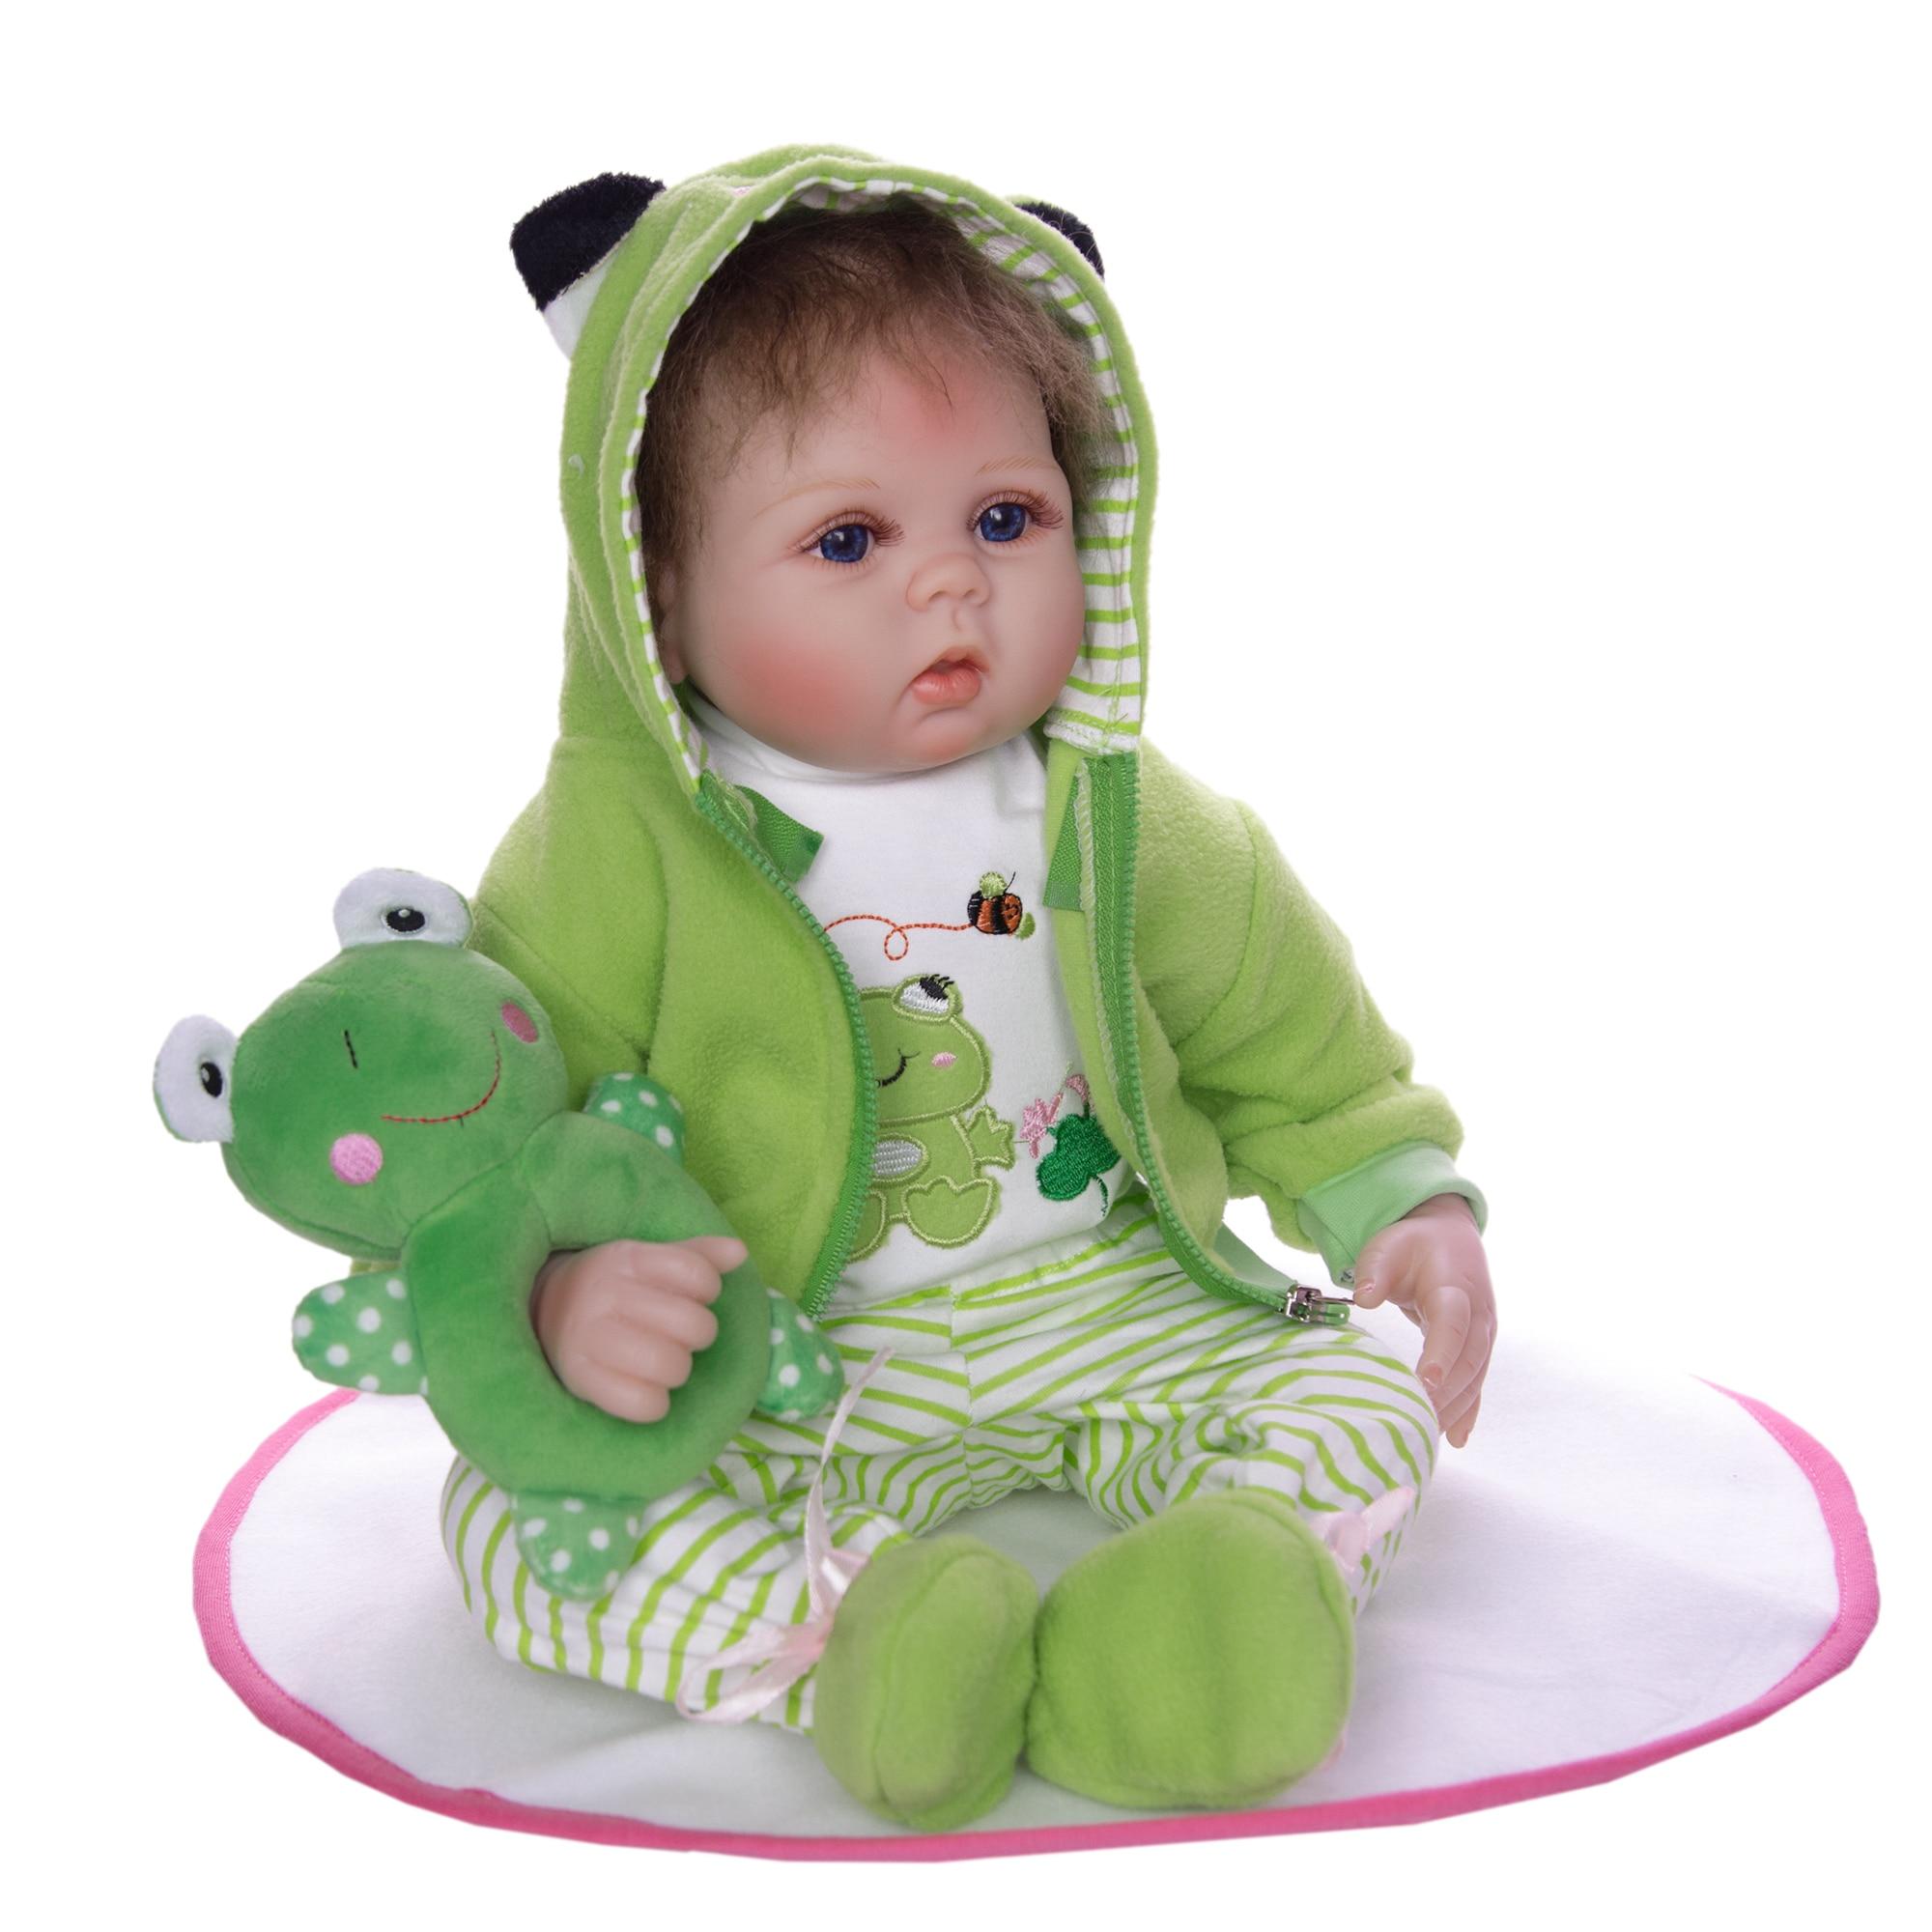 KEIUMI ซิลิโคนนุ่มตุ๊กตาเด็กทารก Reborn 55 ซม.ของเล่นสำหรับ Reborn Boneca ตุ๊กตาวันเกิดของขวัญเด็กก่อนนอน Early การศึกษา-ใน ตุ๊กตา จาก ของเล่นและงานอดิเรก บน   2